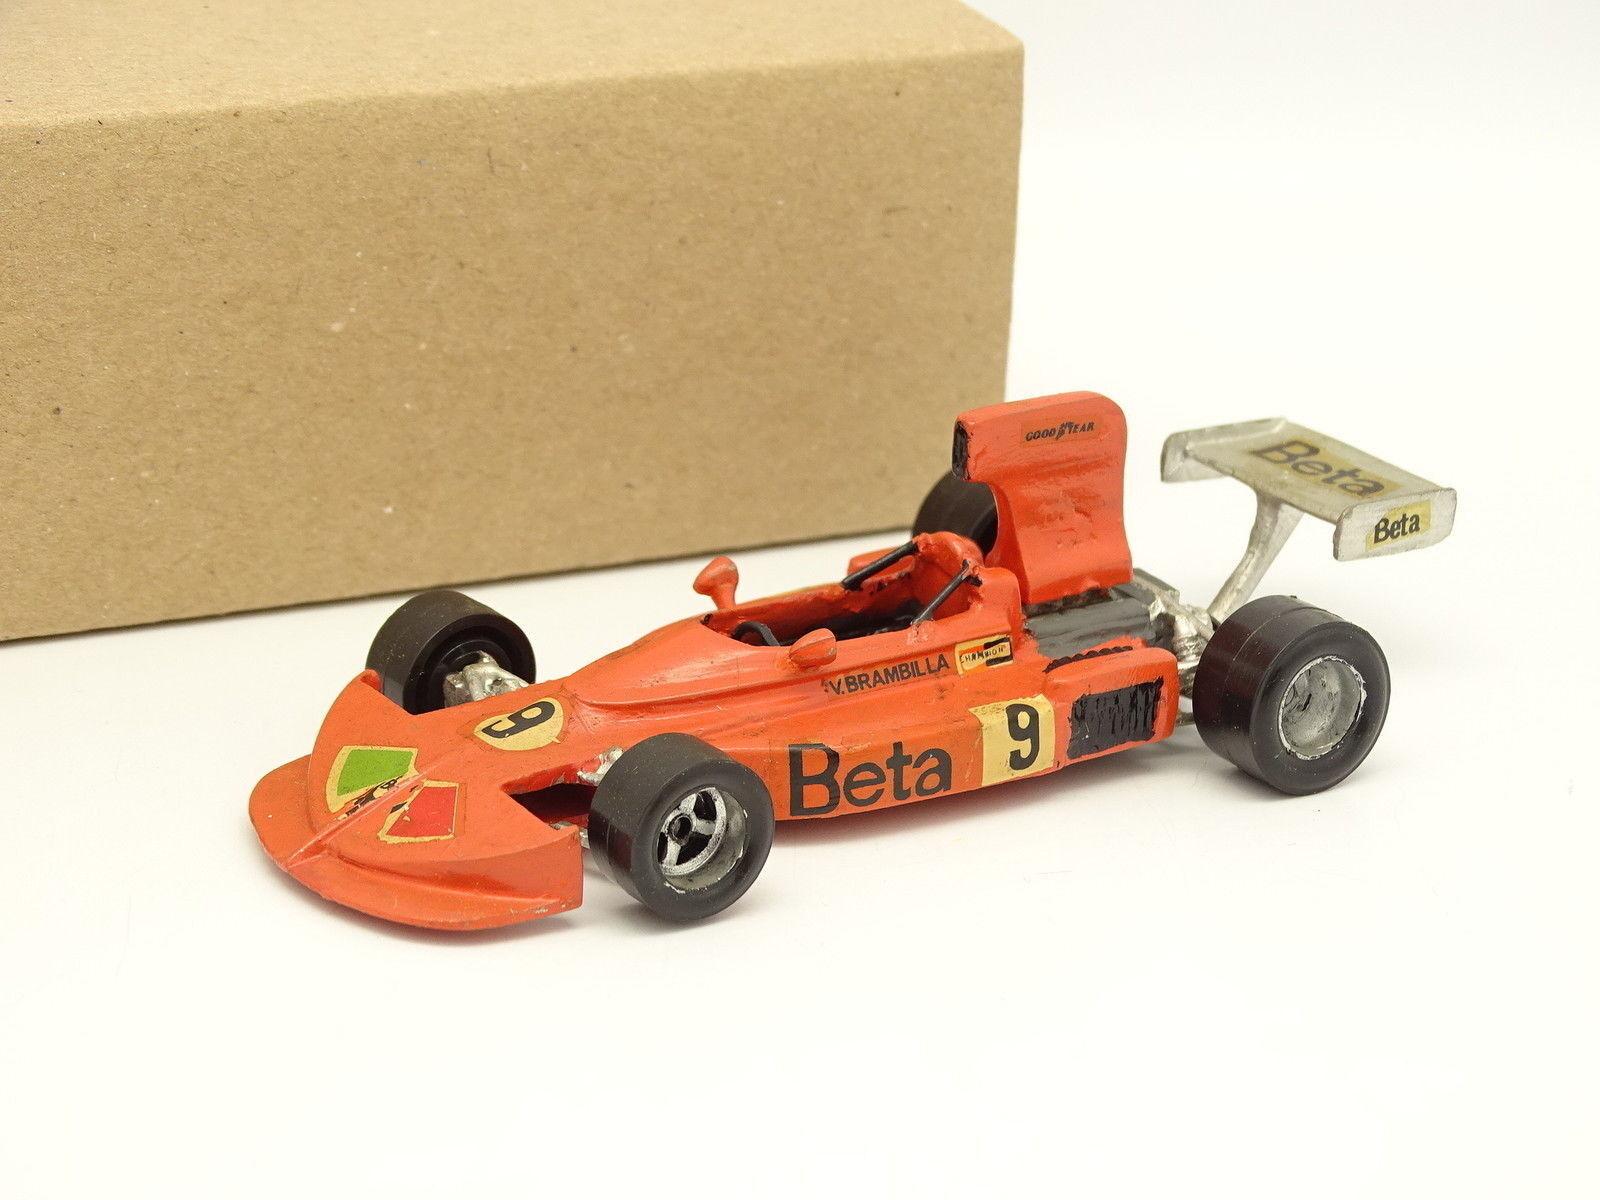 John Day Kit Metal Montado 1 43 F1 MARZO 751 Vittorio Brambilla 1975 Austrian GP